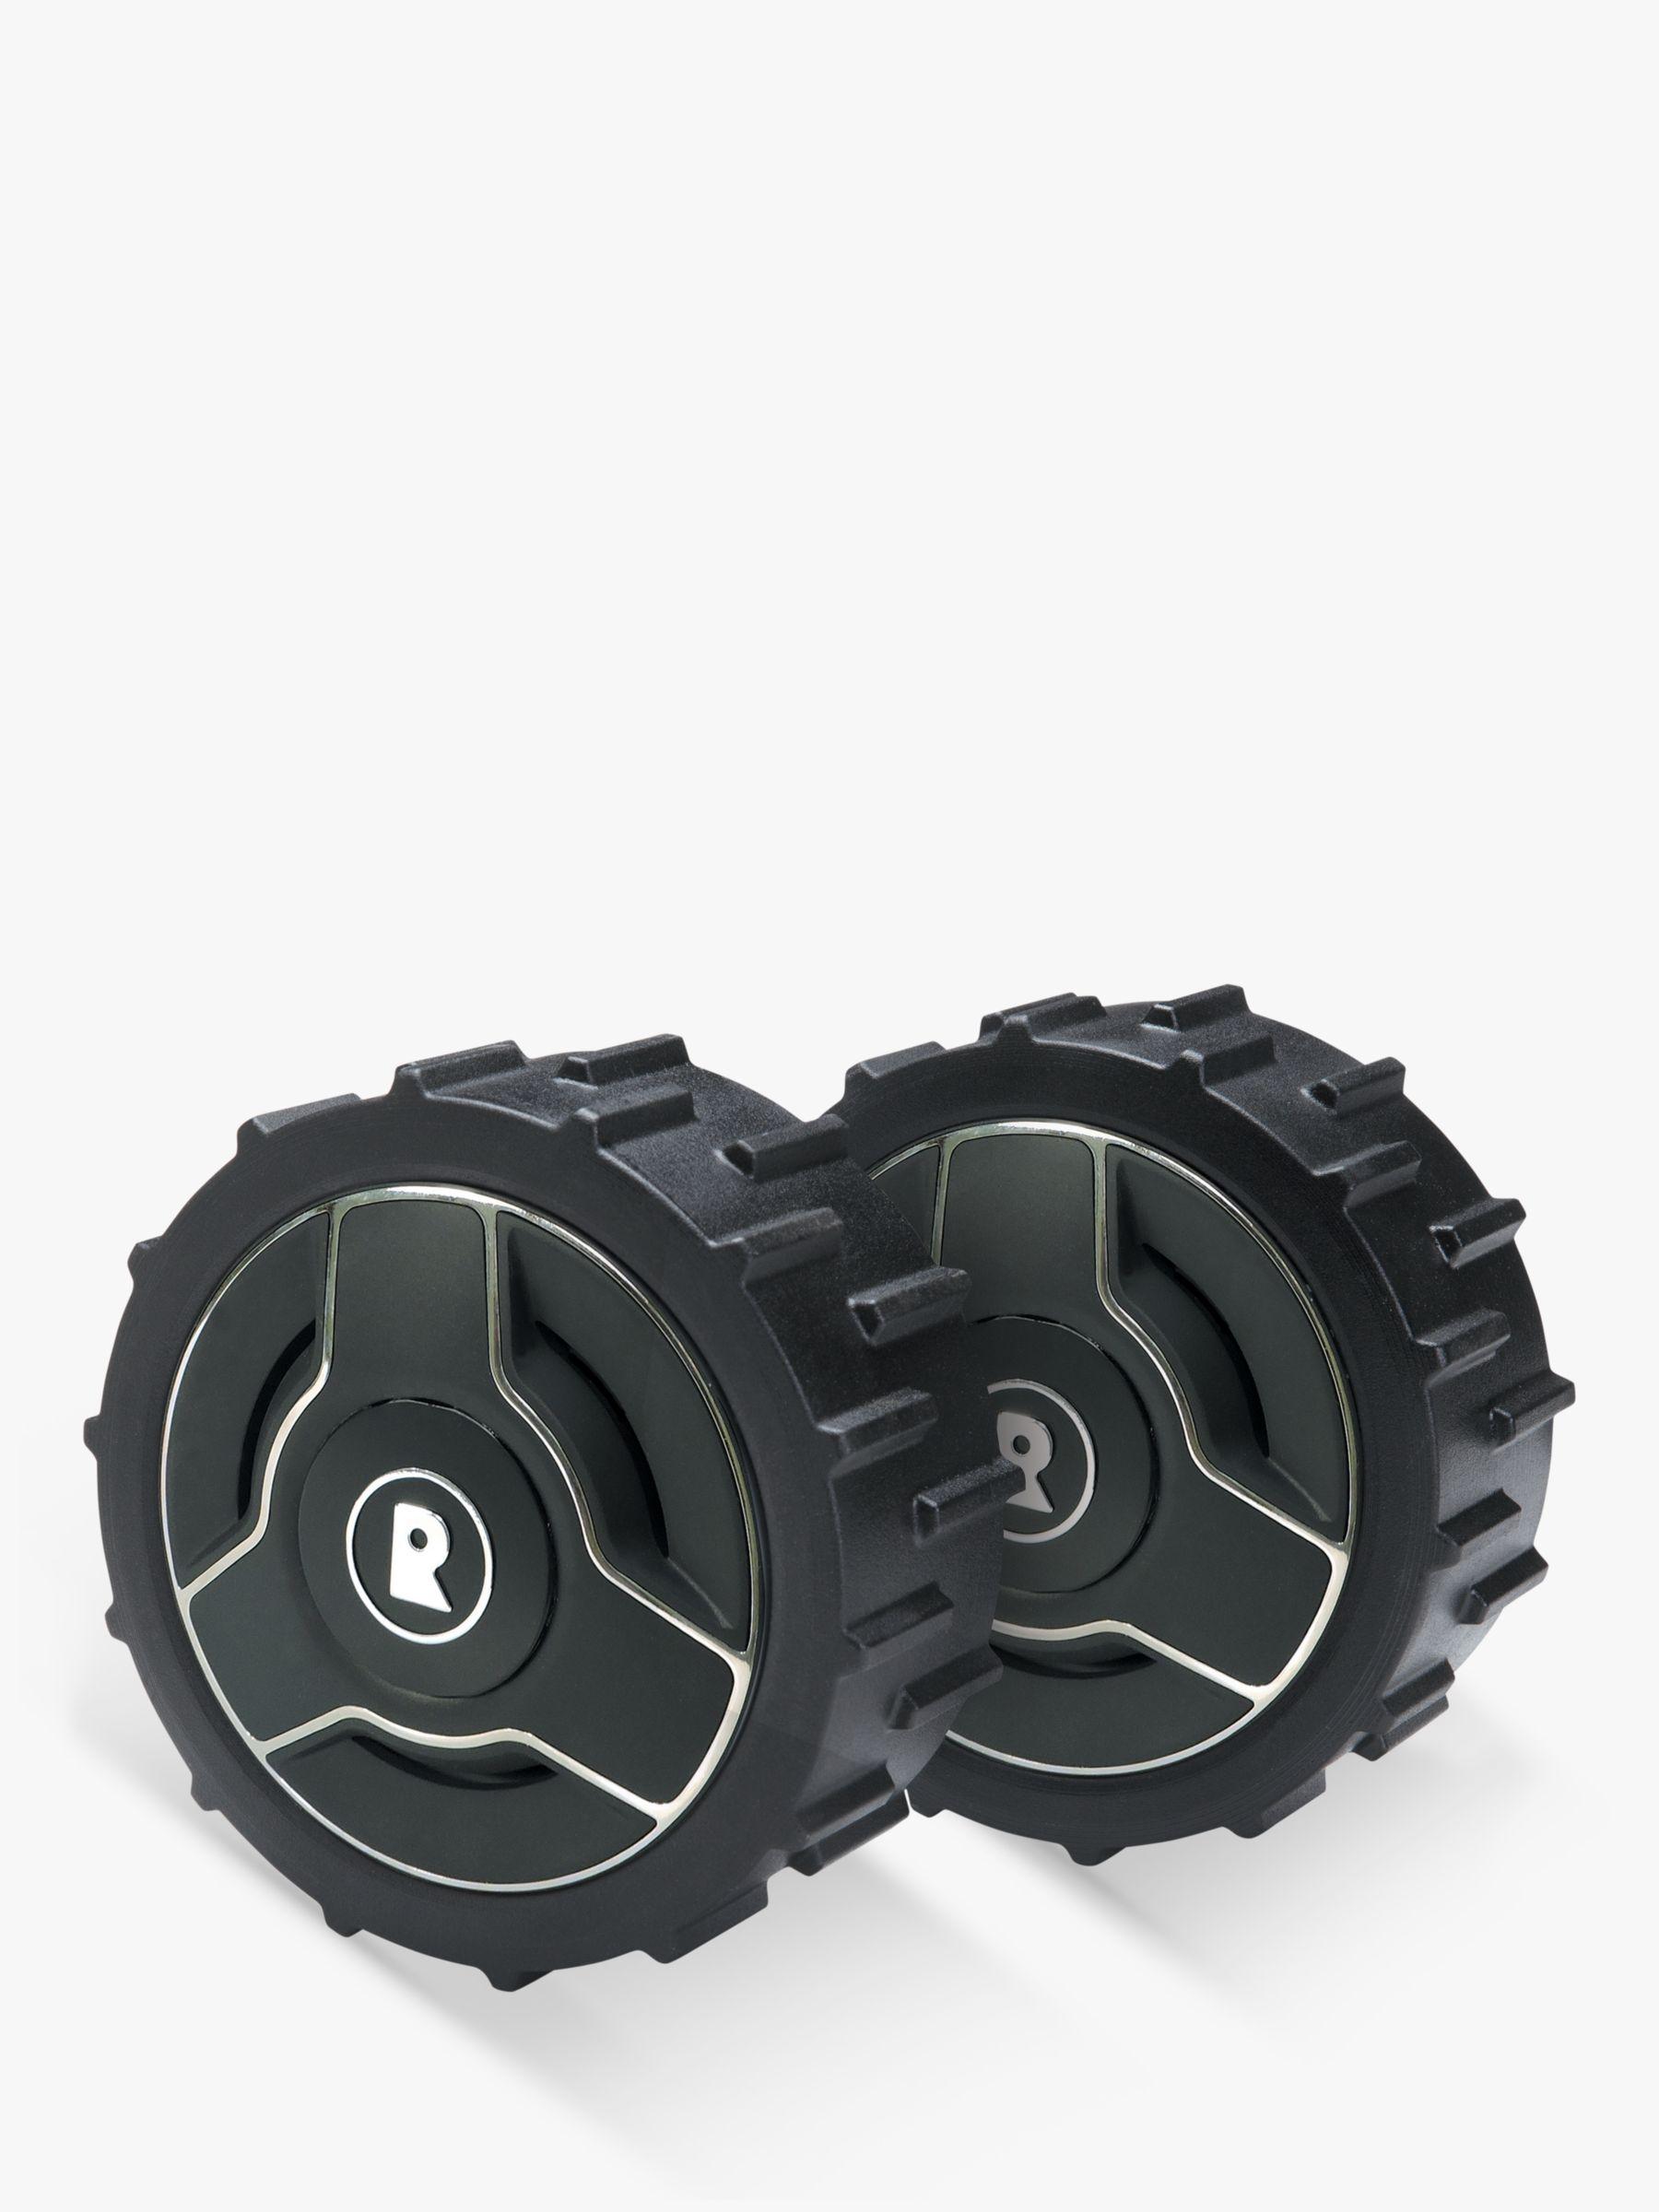 Robomow Robomow MRK7012A Power Wheels for RC Models